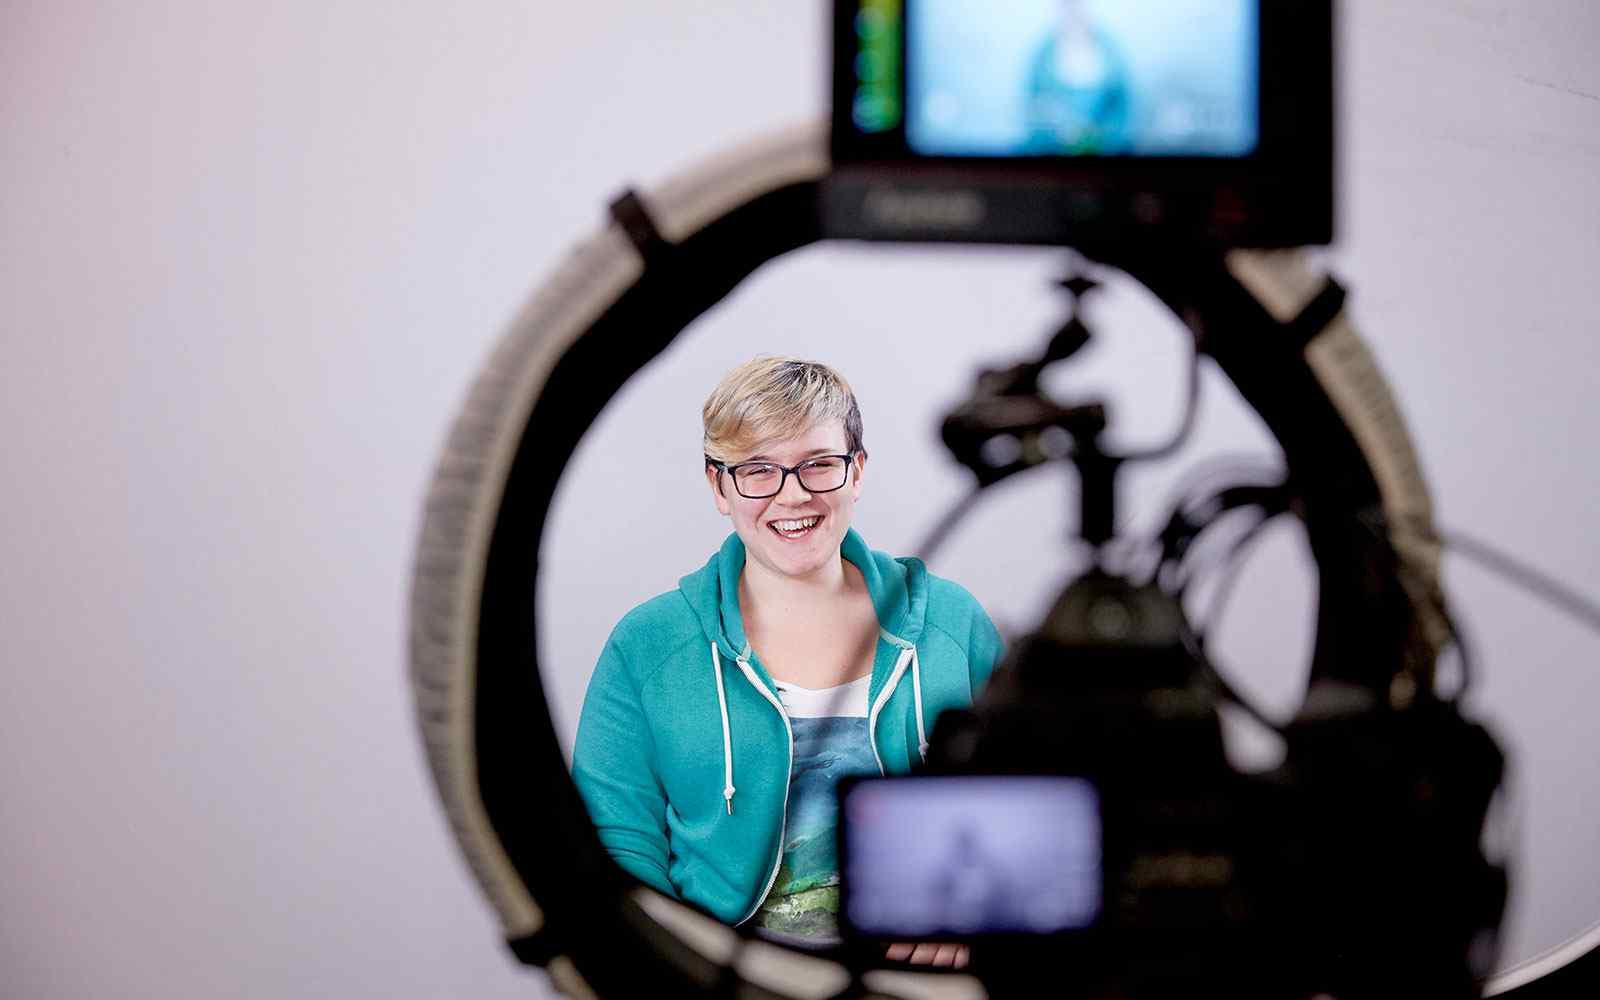 Media Production student being filmed